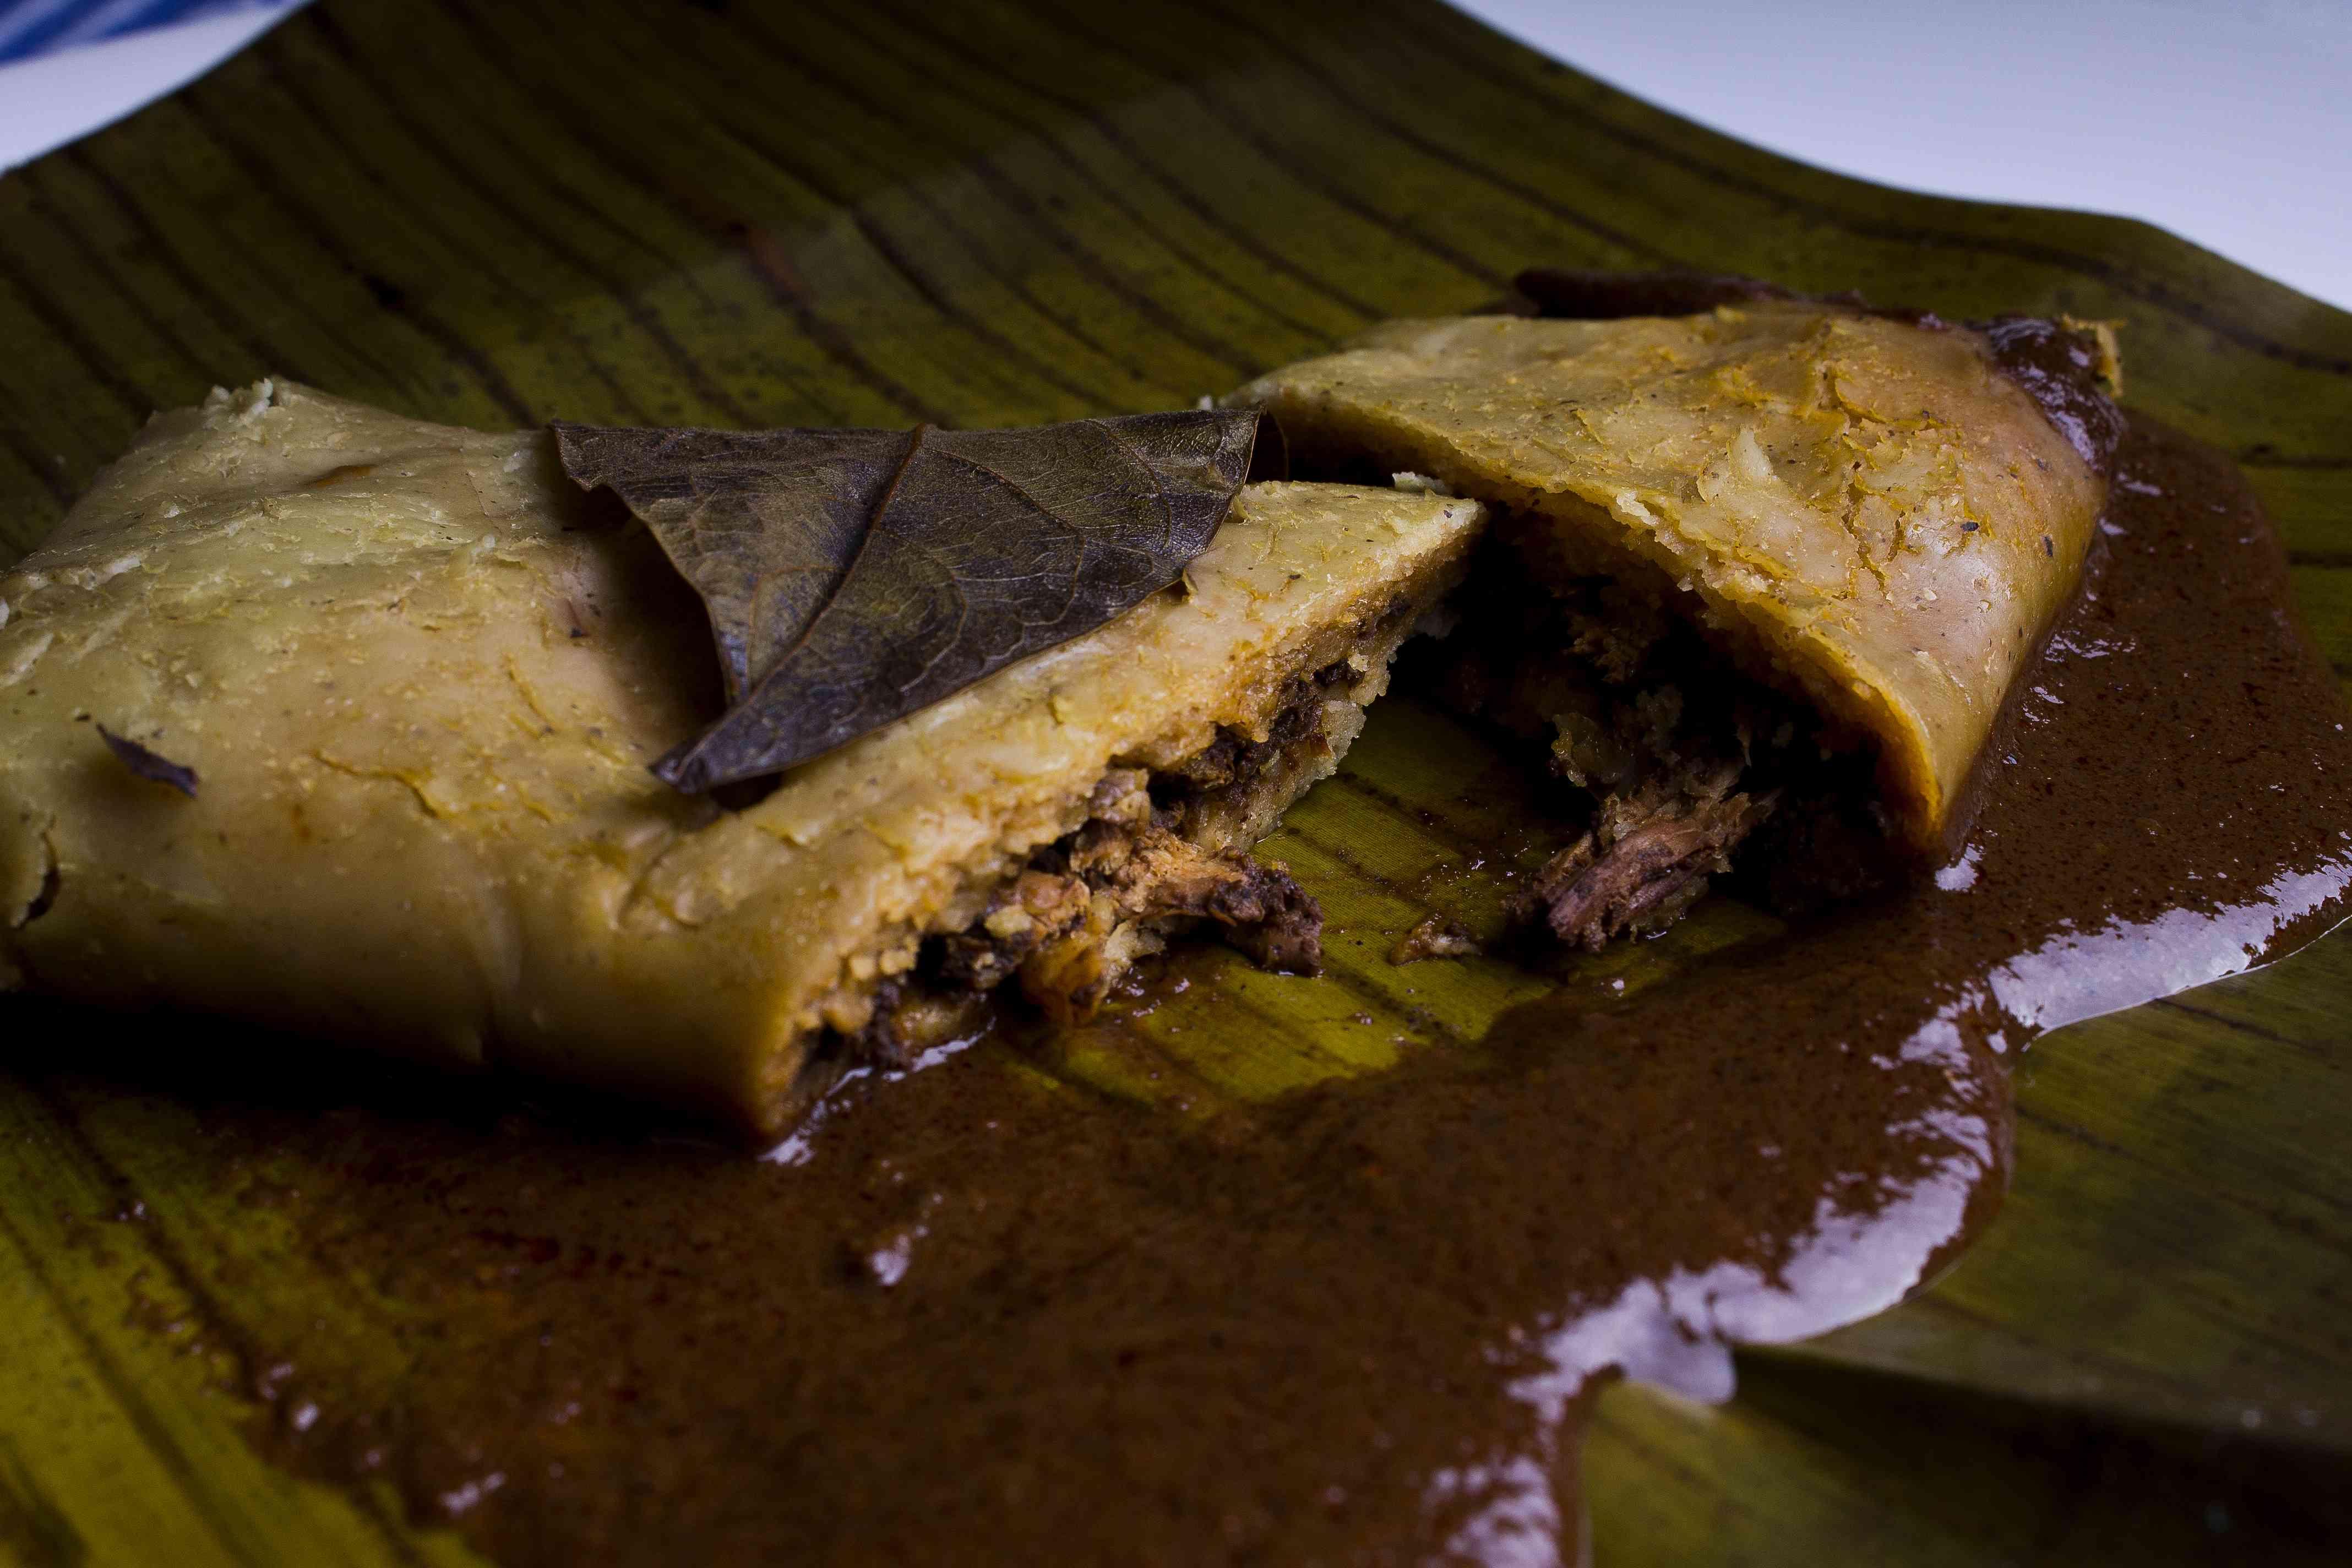 Oaxacan tamal made with black mole